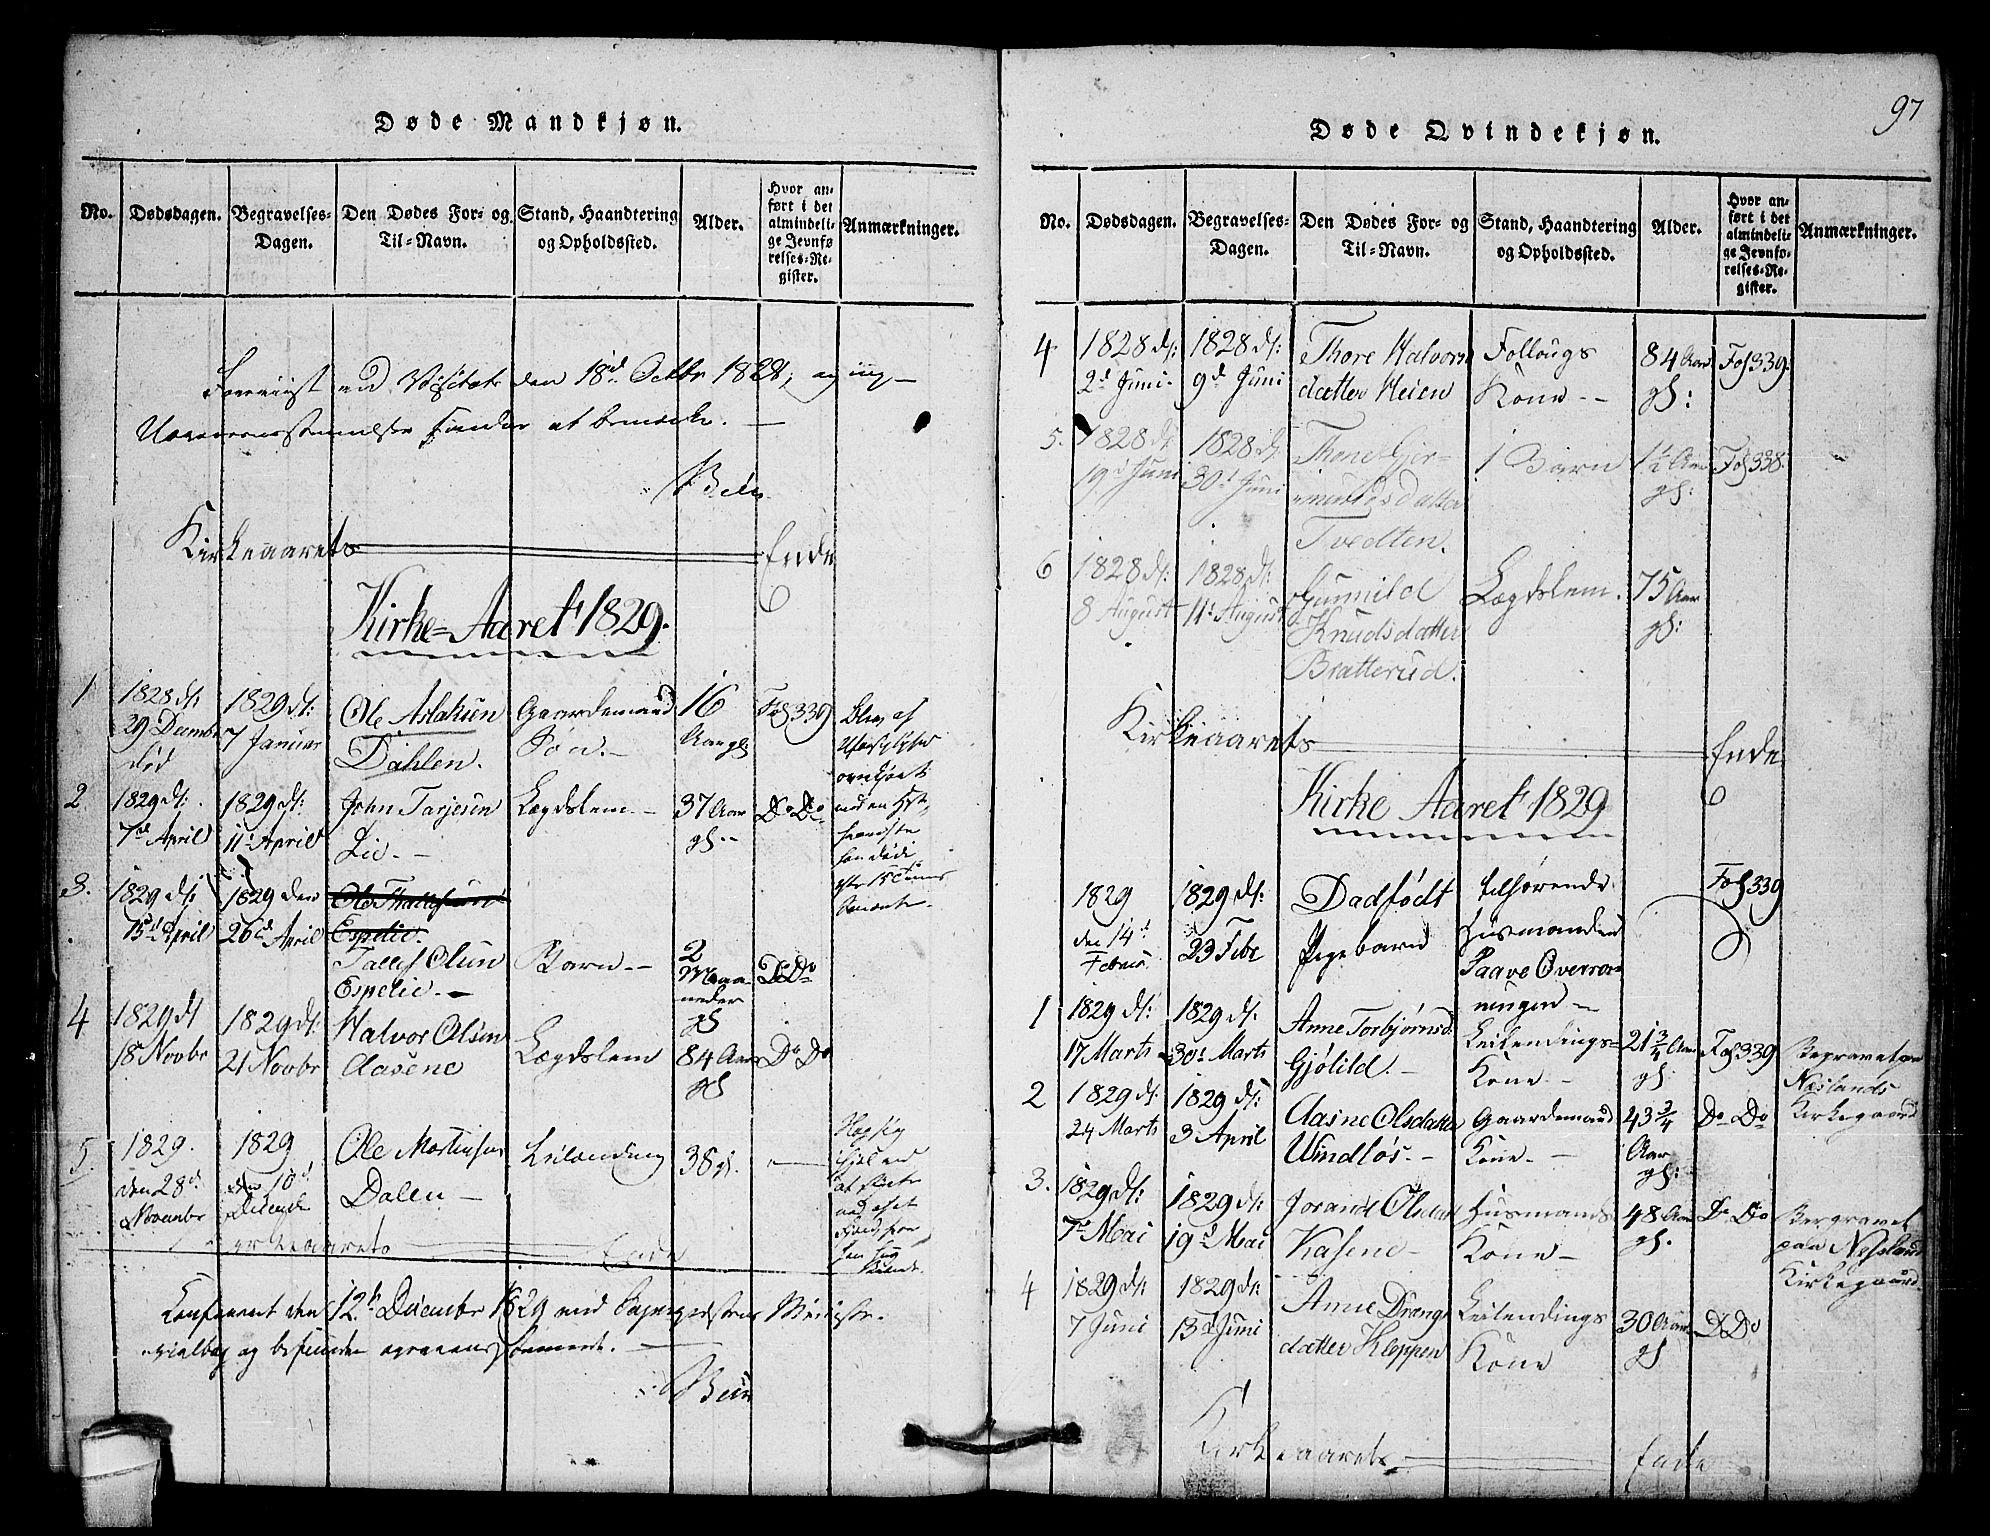 SAKO, Lårdal kirkebøker, G/Gb/L0001: Klokkerbok nr. II 1, 1815-1865, s. 97